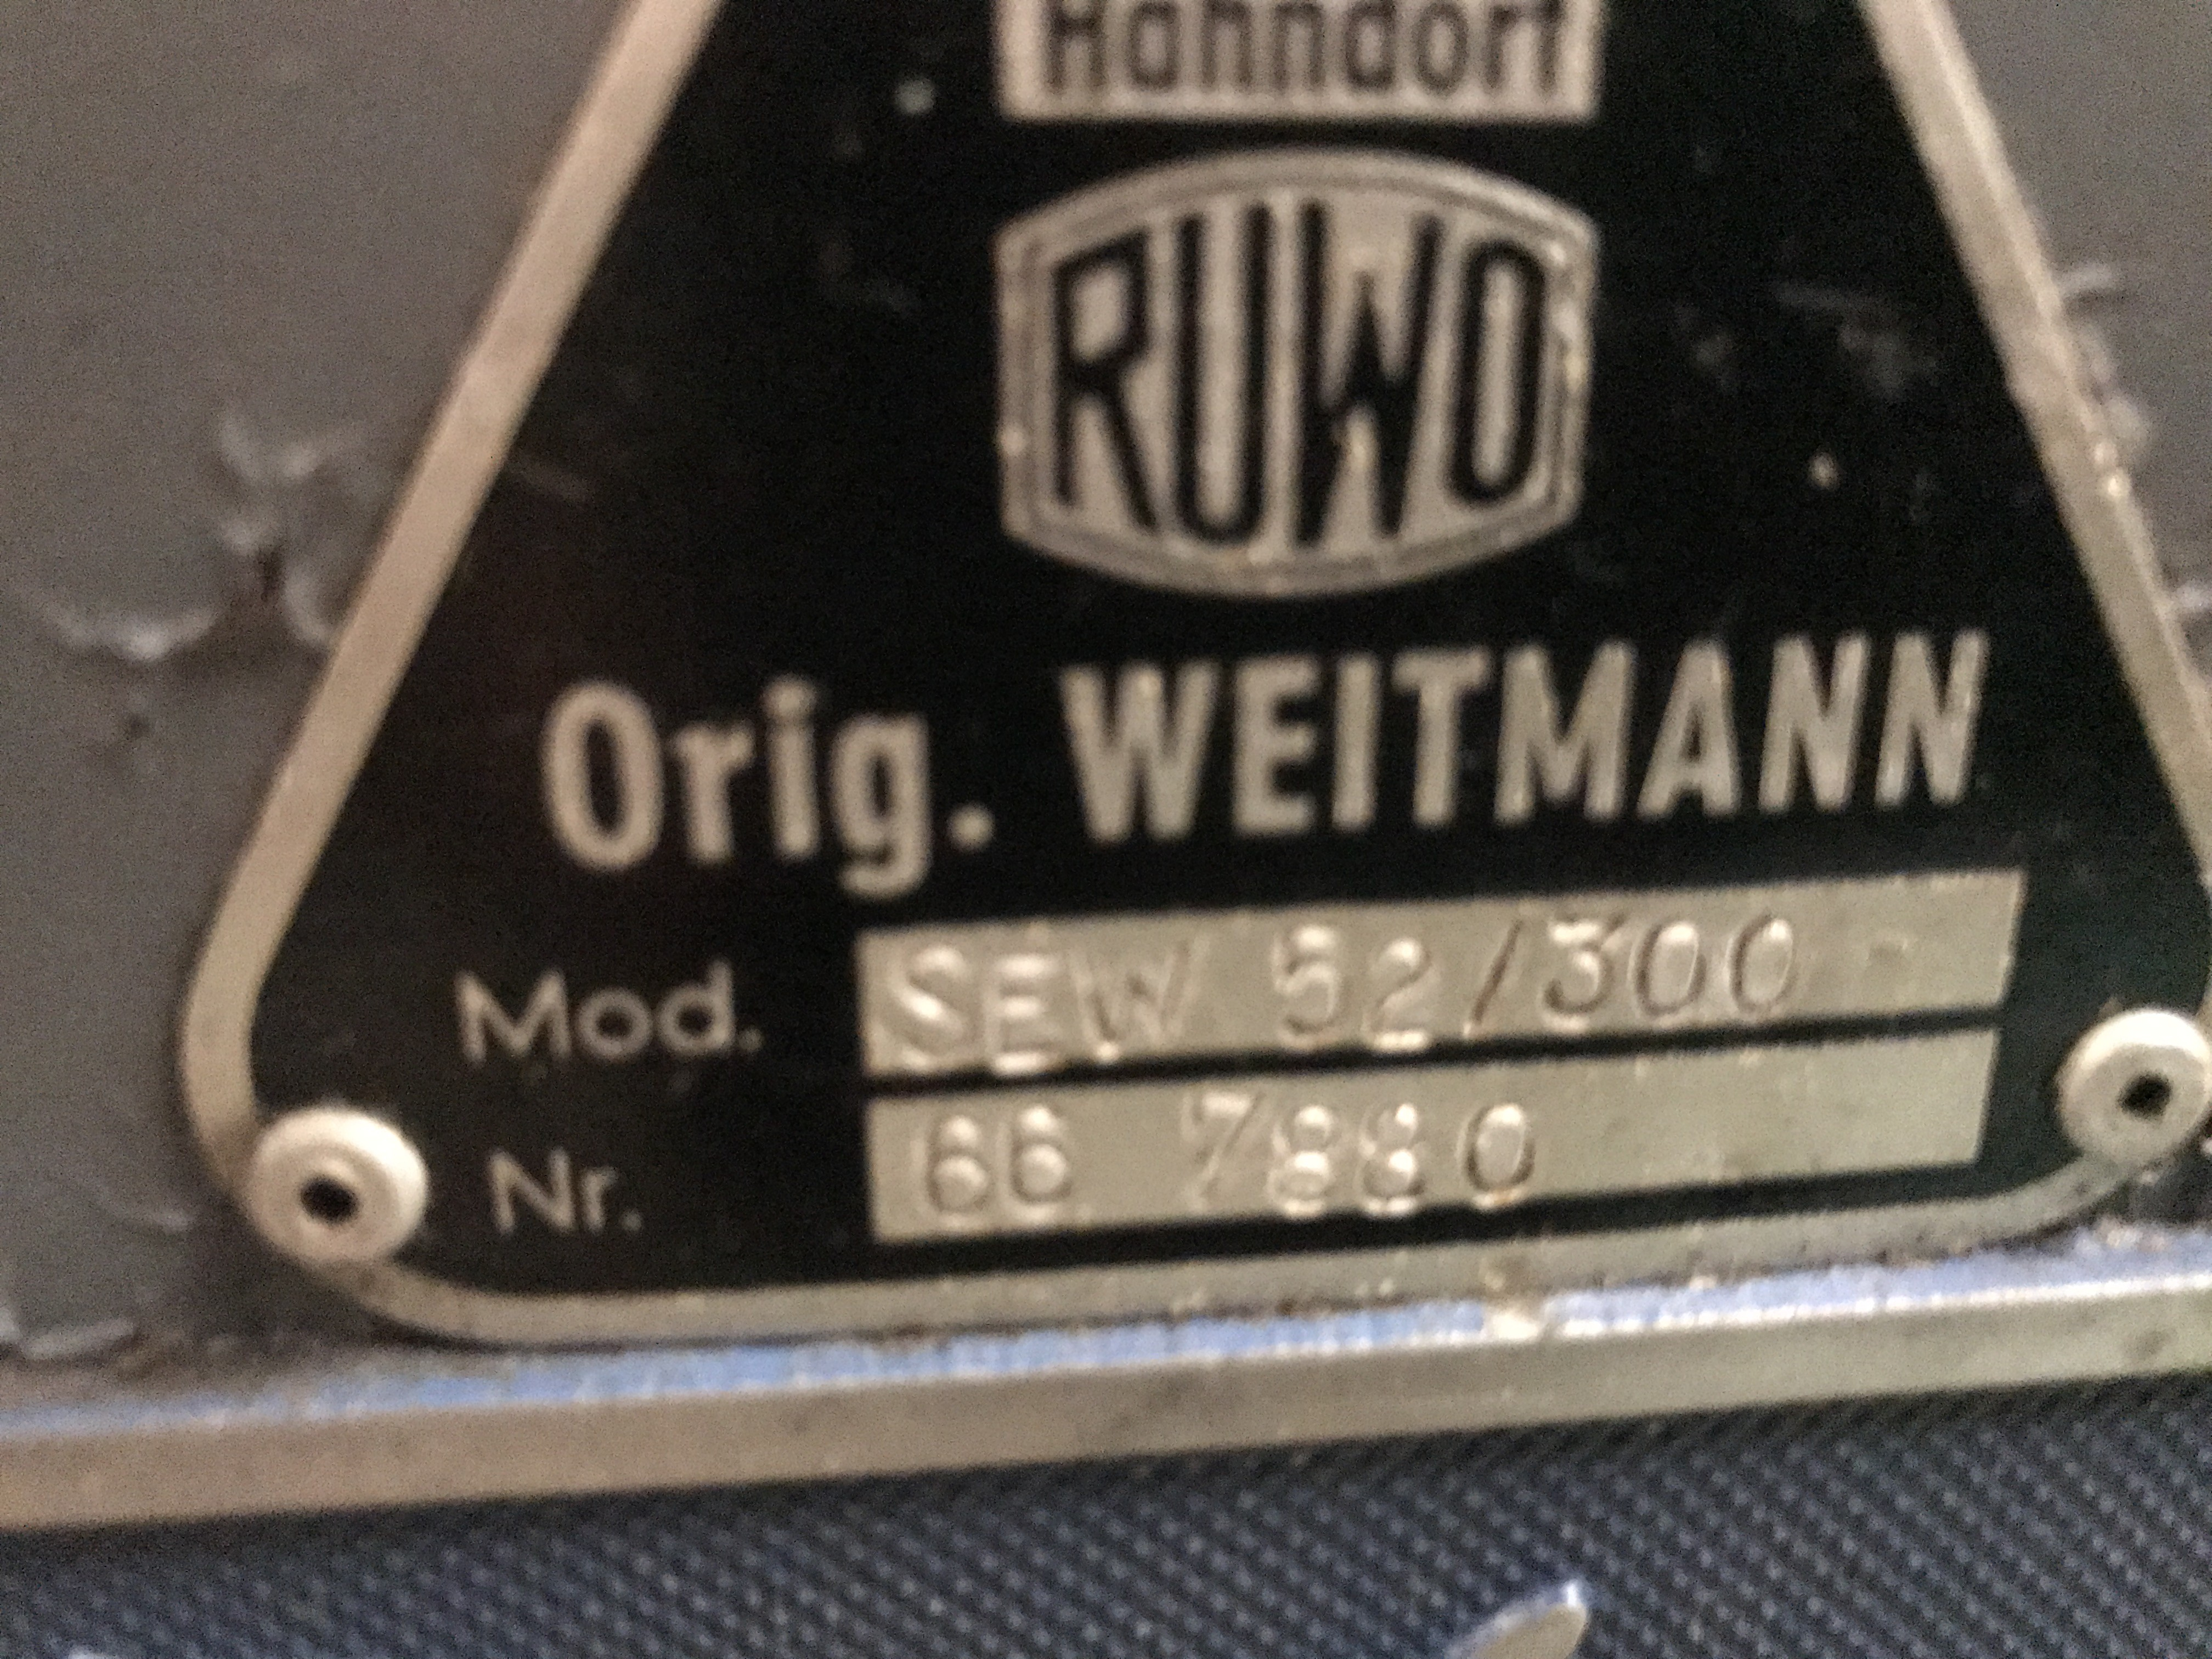 Шпоночно-долбёжный станок RUWO-HAHNDORF SEW 52/300 SEW 52/300 фото на Industry-Pilot